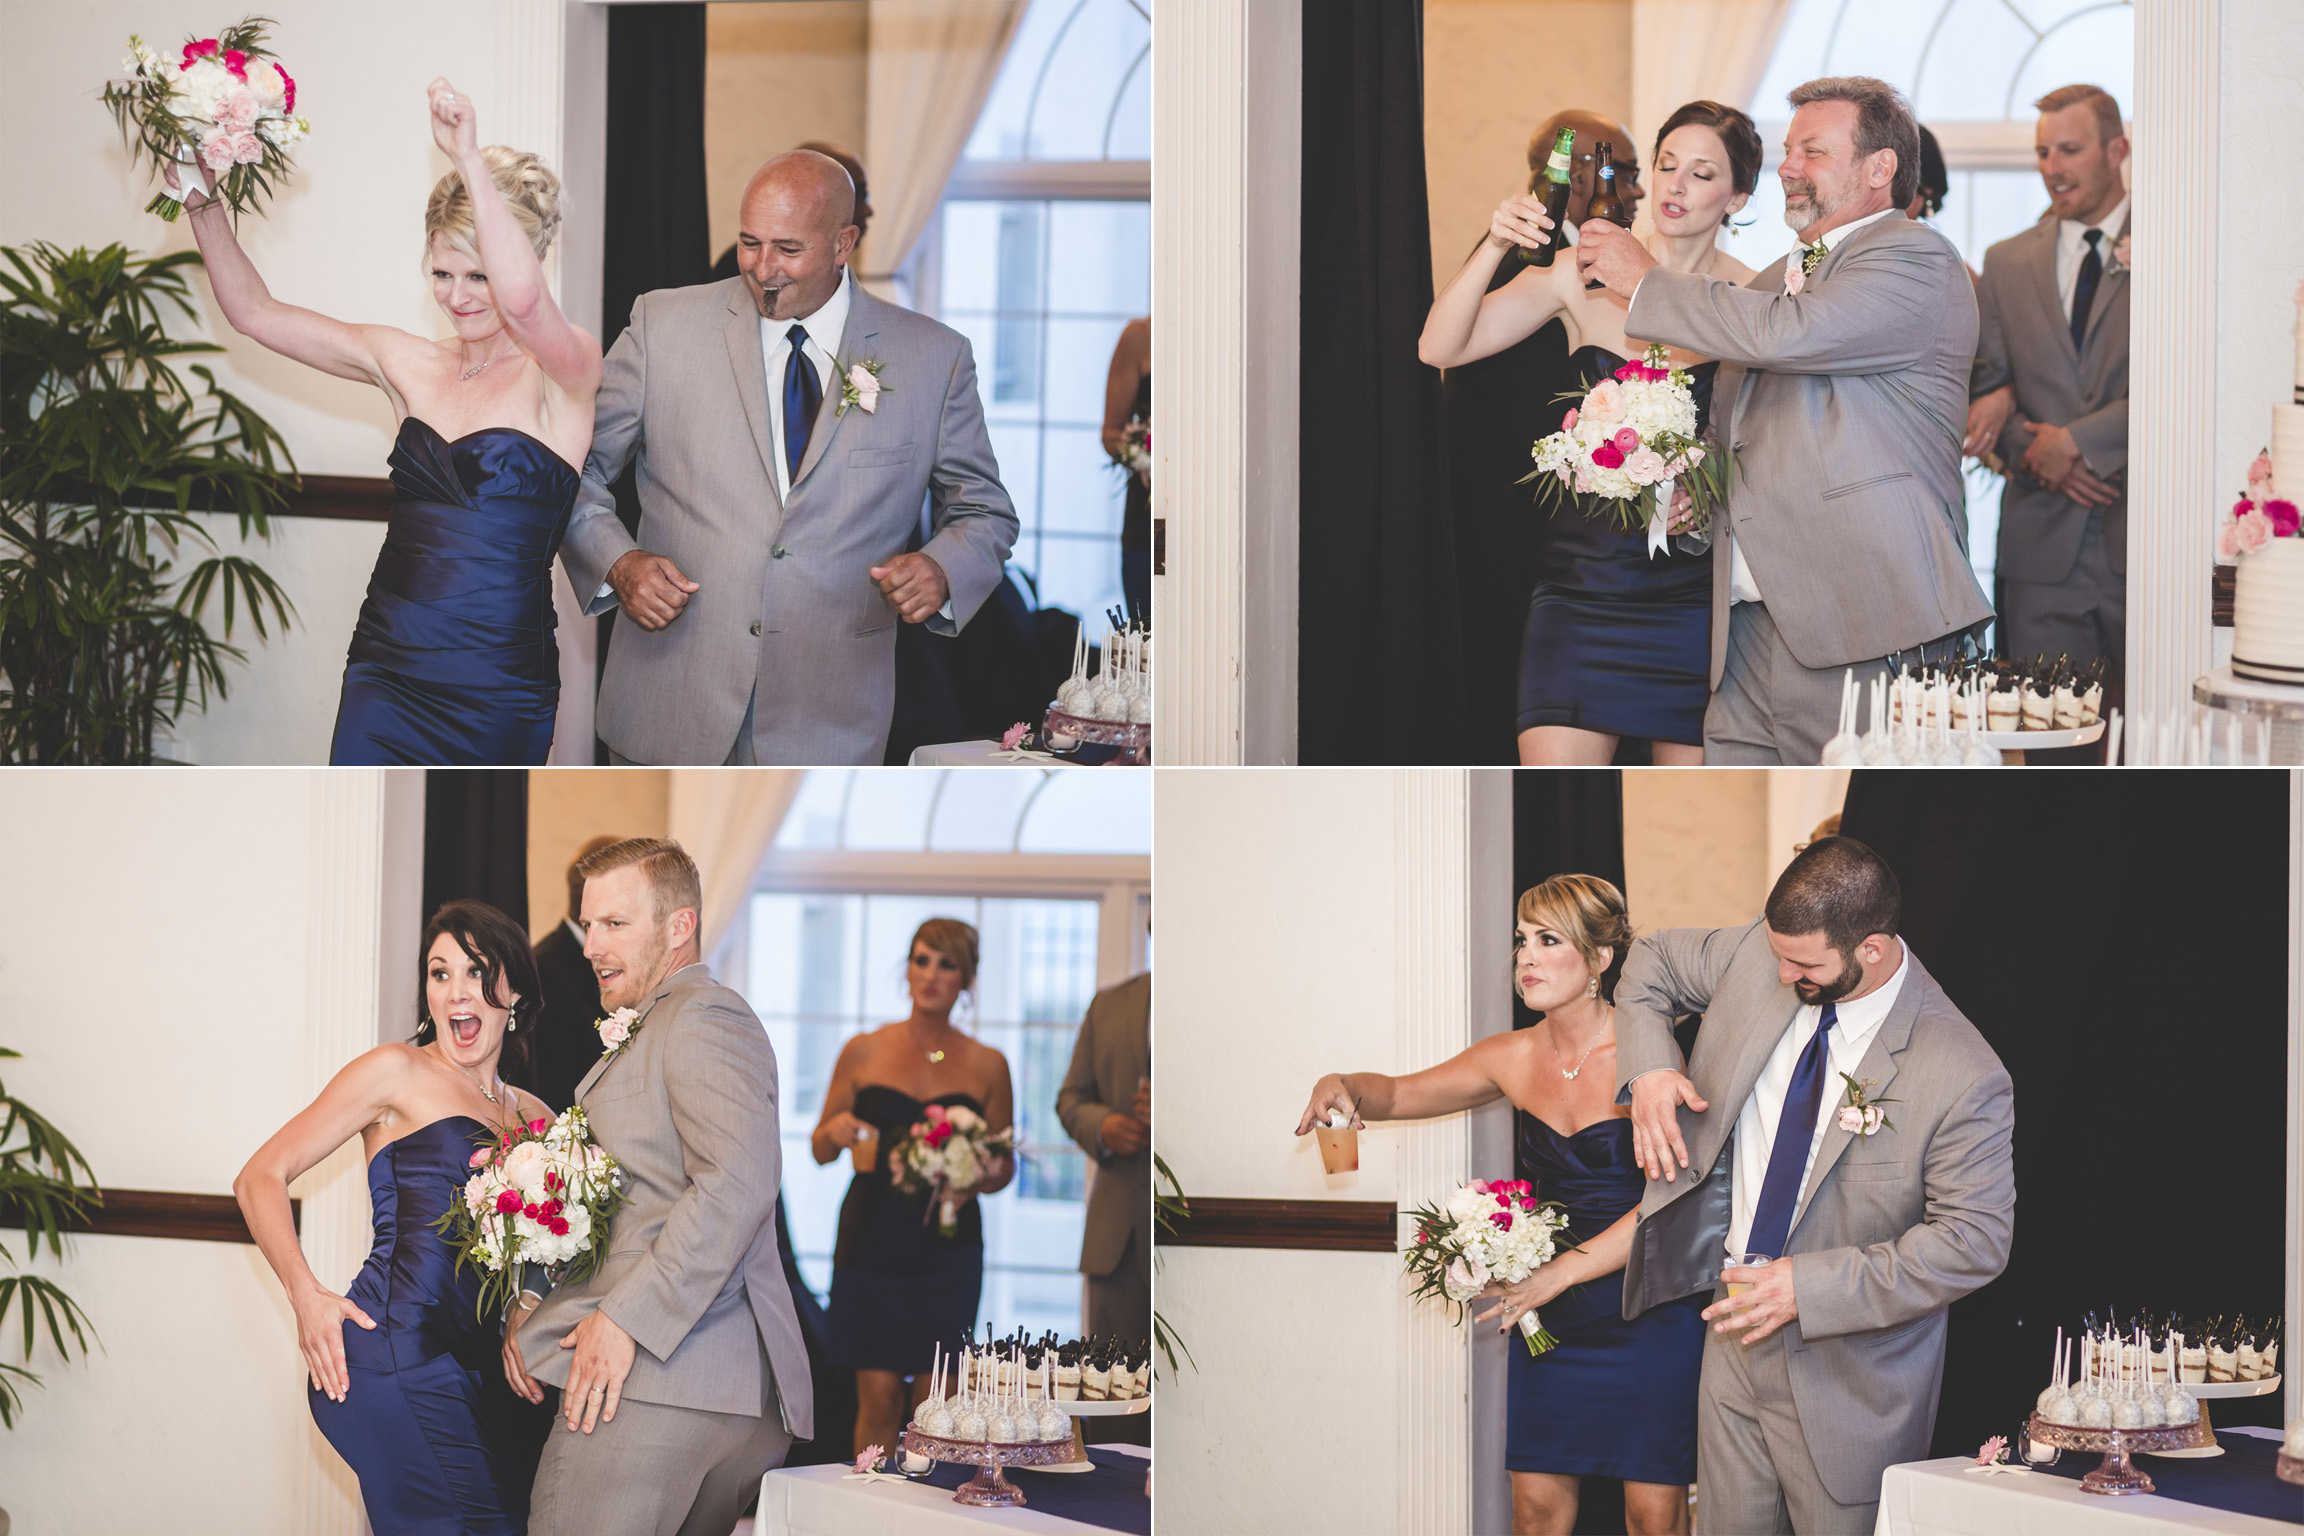 adam-szarmack-casa-marina-wedding-photographer-jacksonville-beach-florida-46.jpg